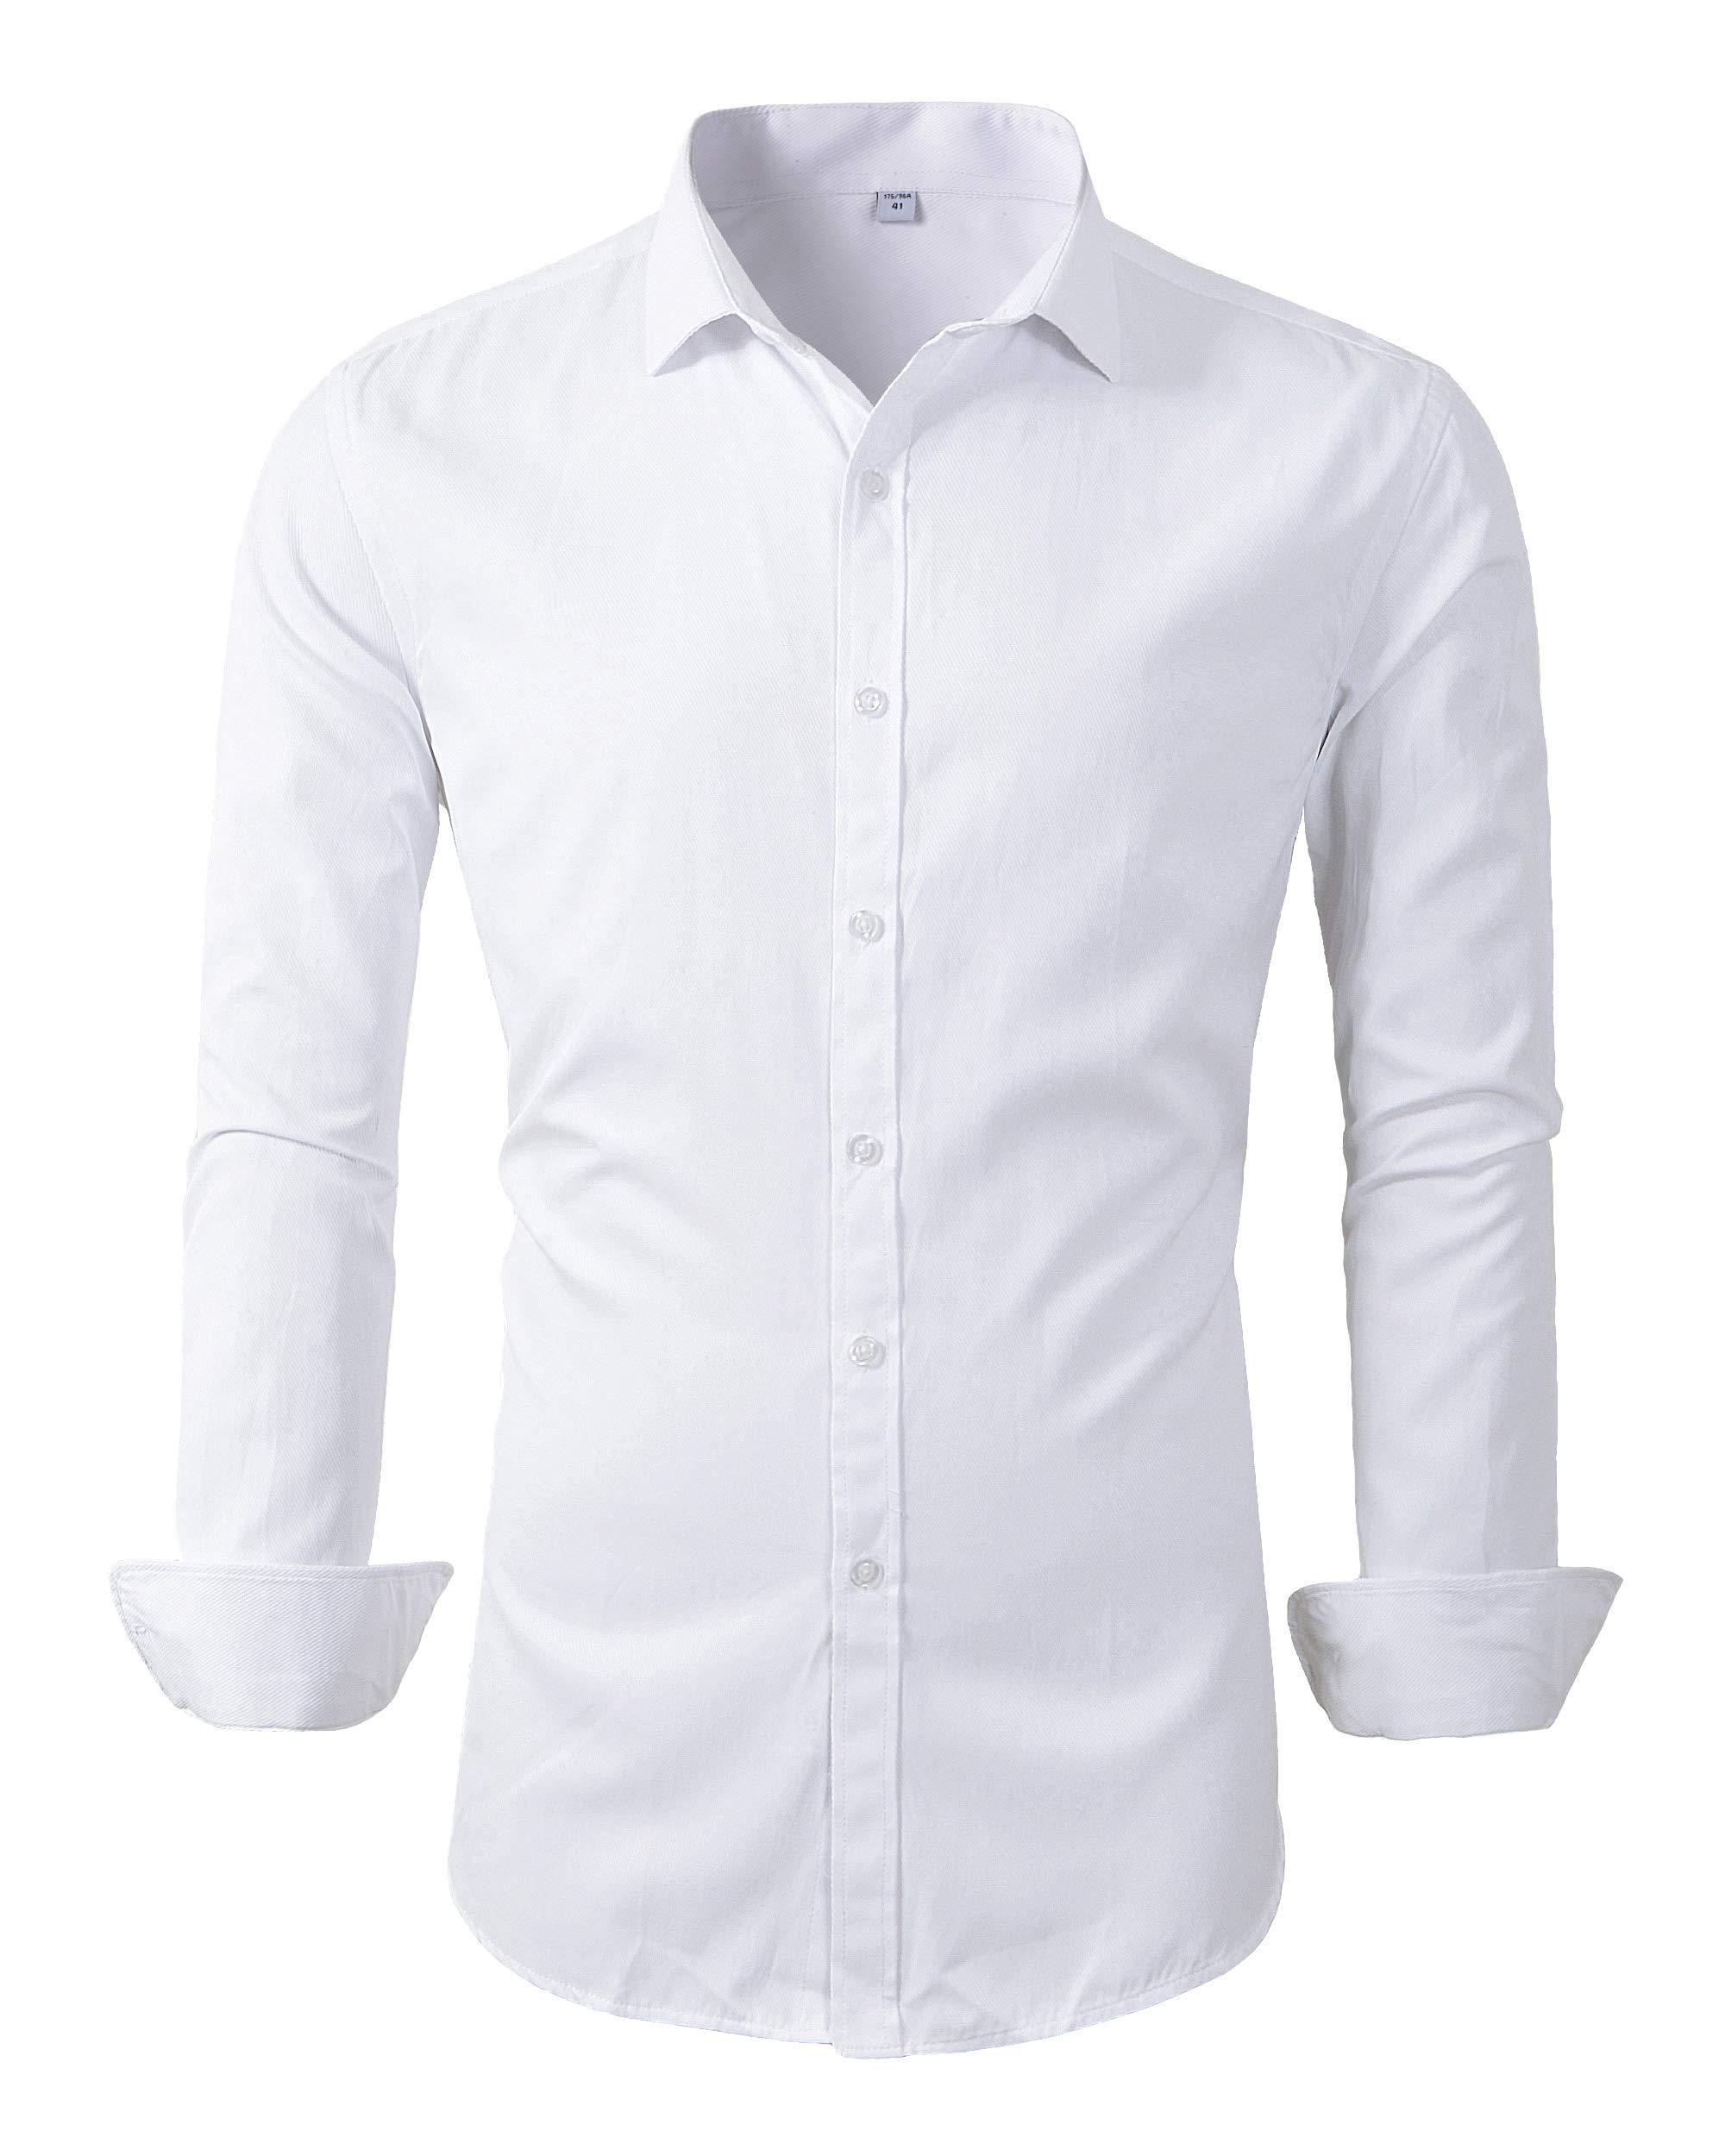 YFFUSHI Mens Slim Fit Plain Dress Shirt Long Sleeve Casual Button Down Shirts